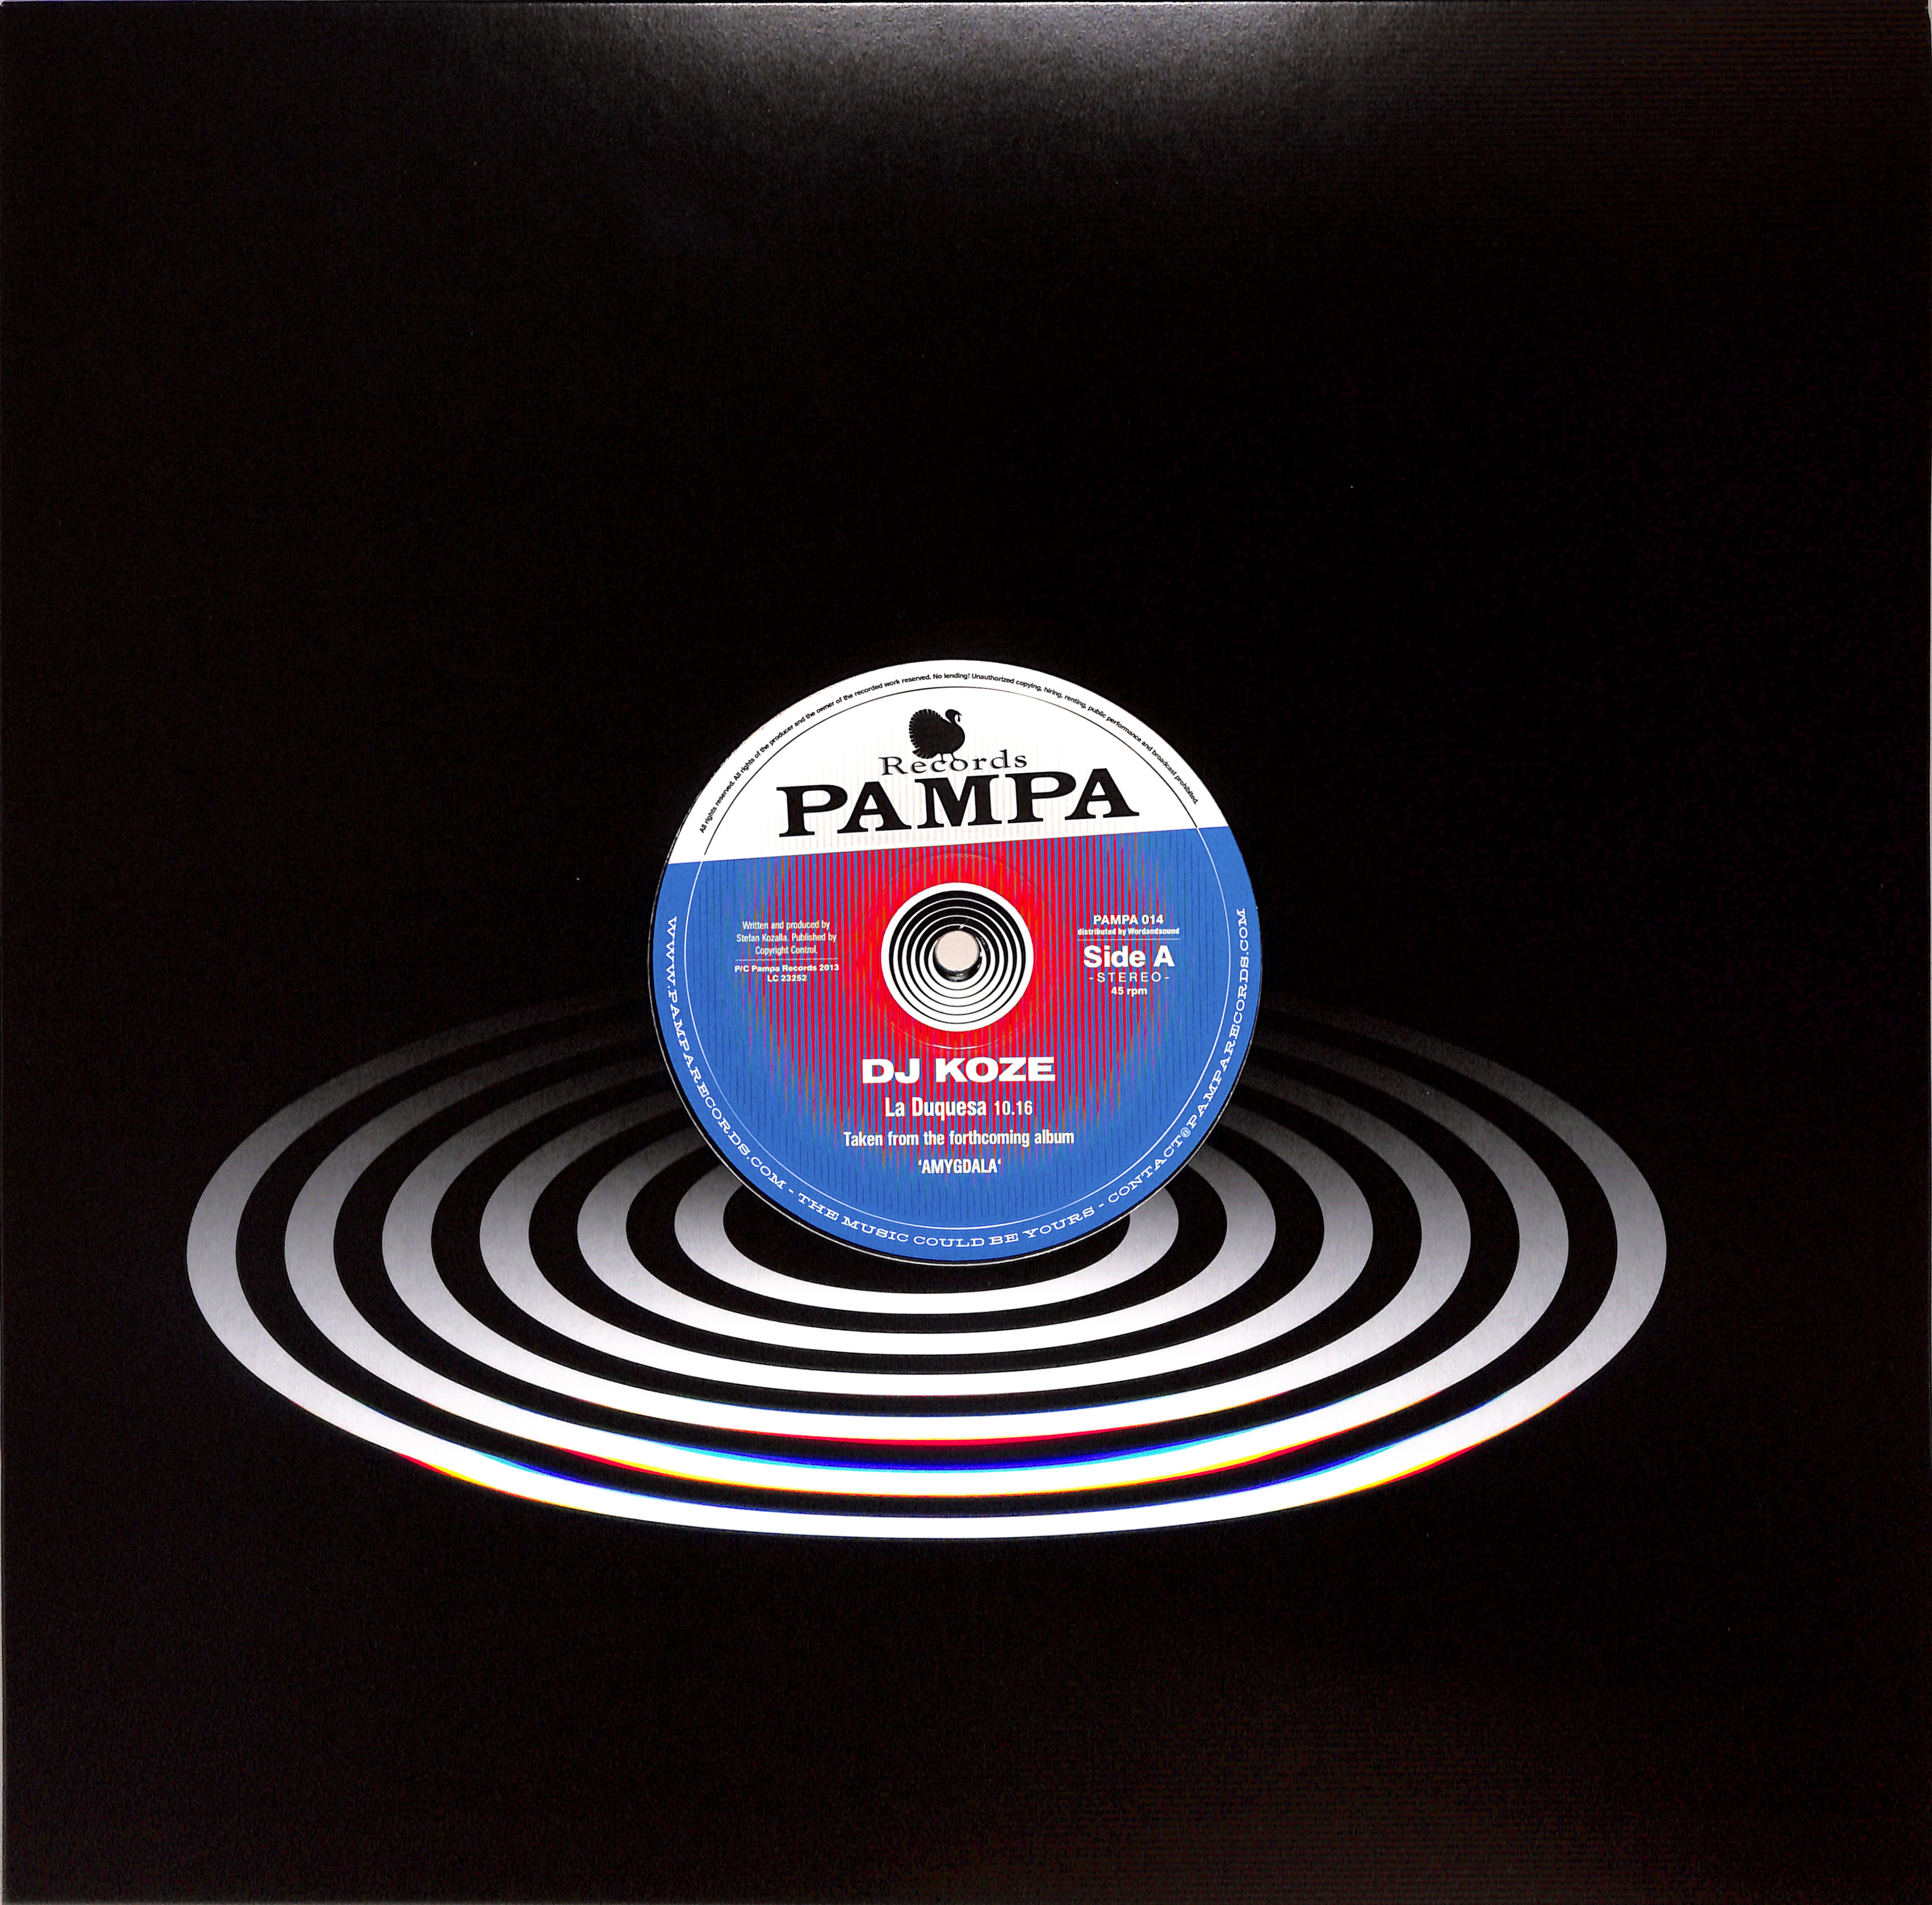 DJ Koze - LA DUQUESA / BURN WITH ME